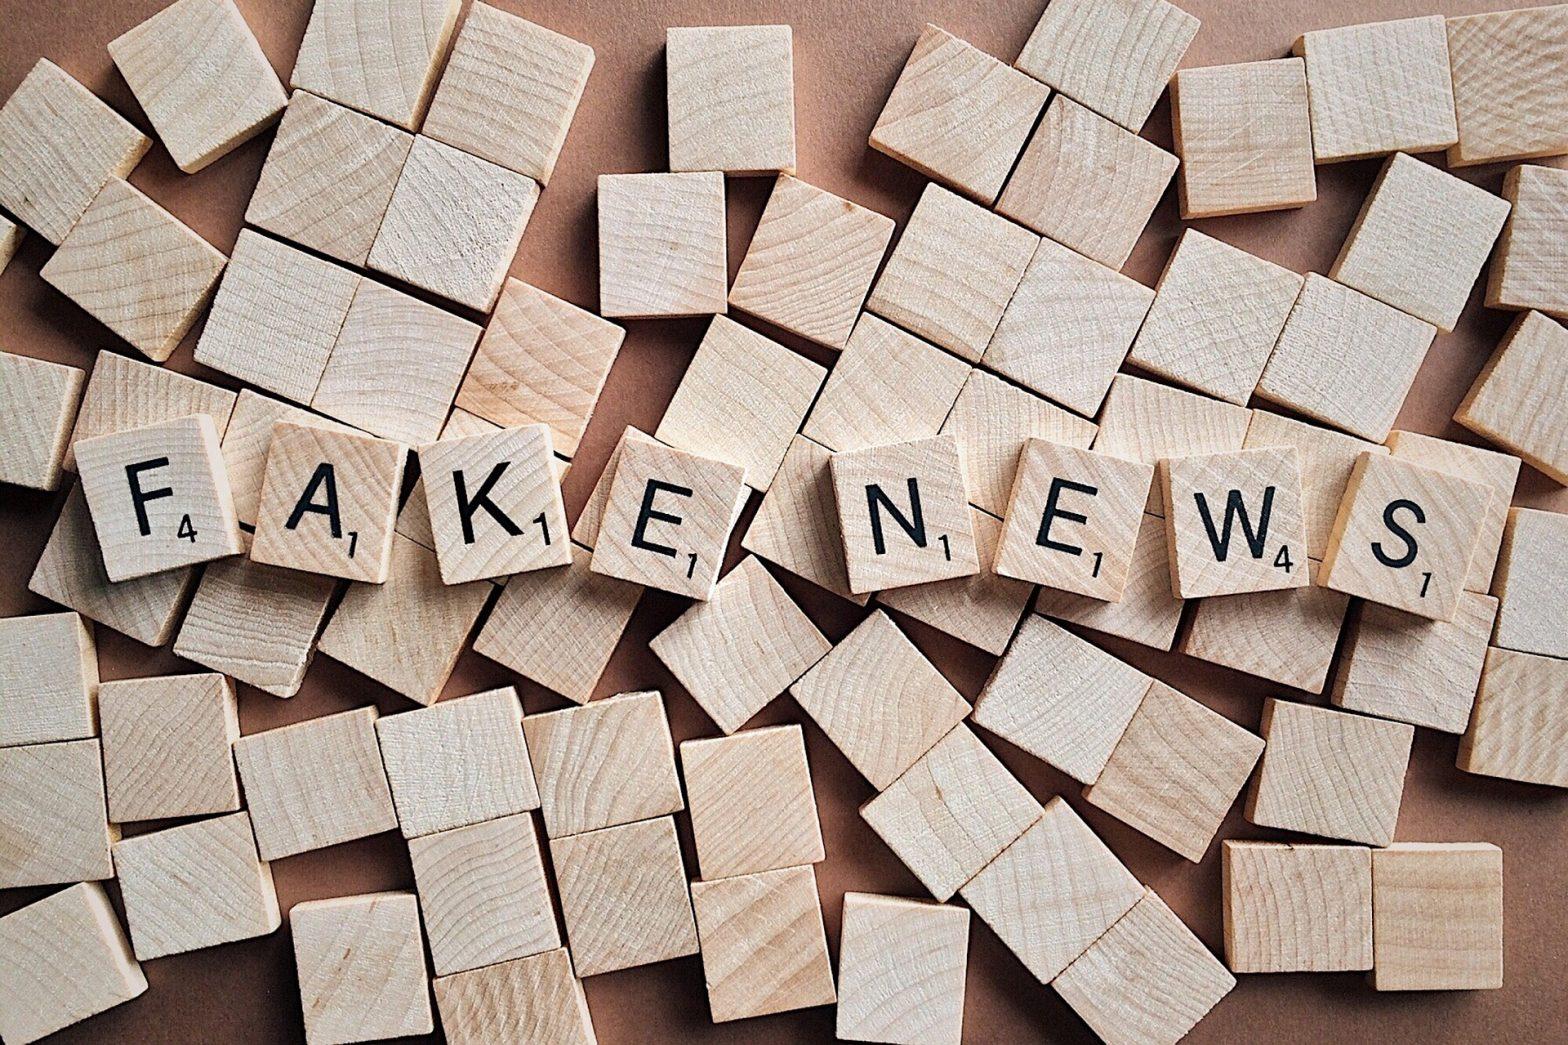 Scrabble fake-news